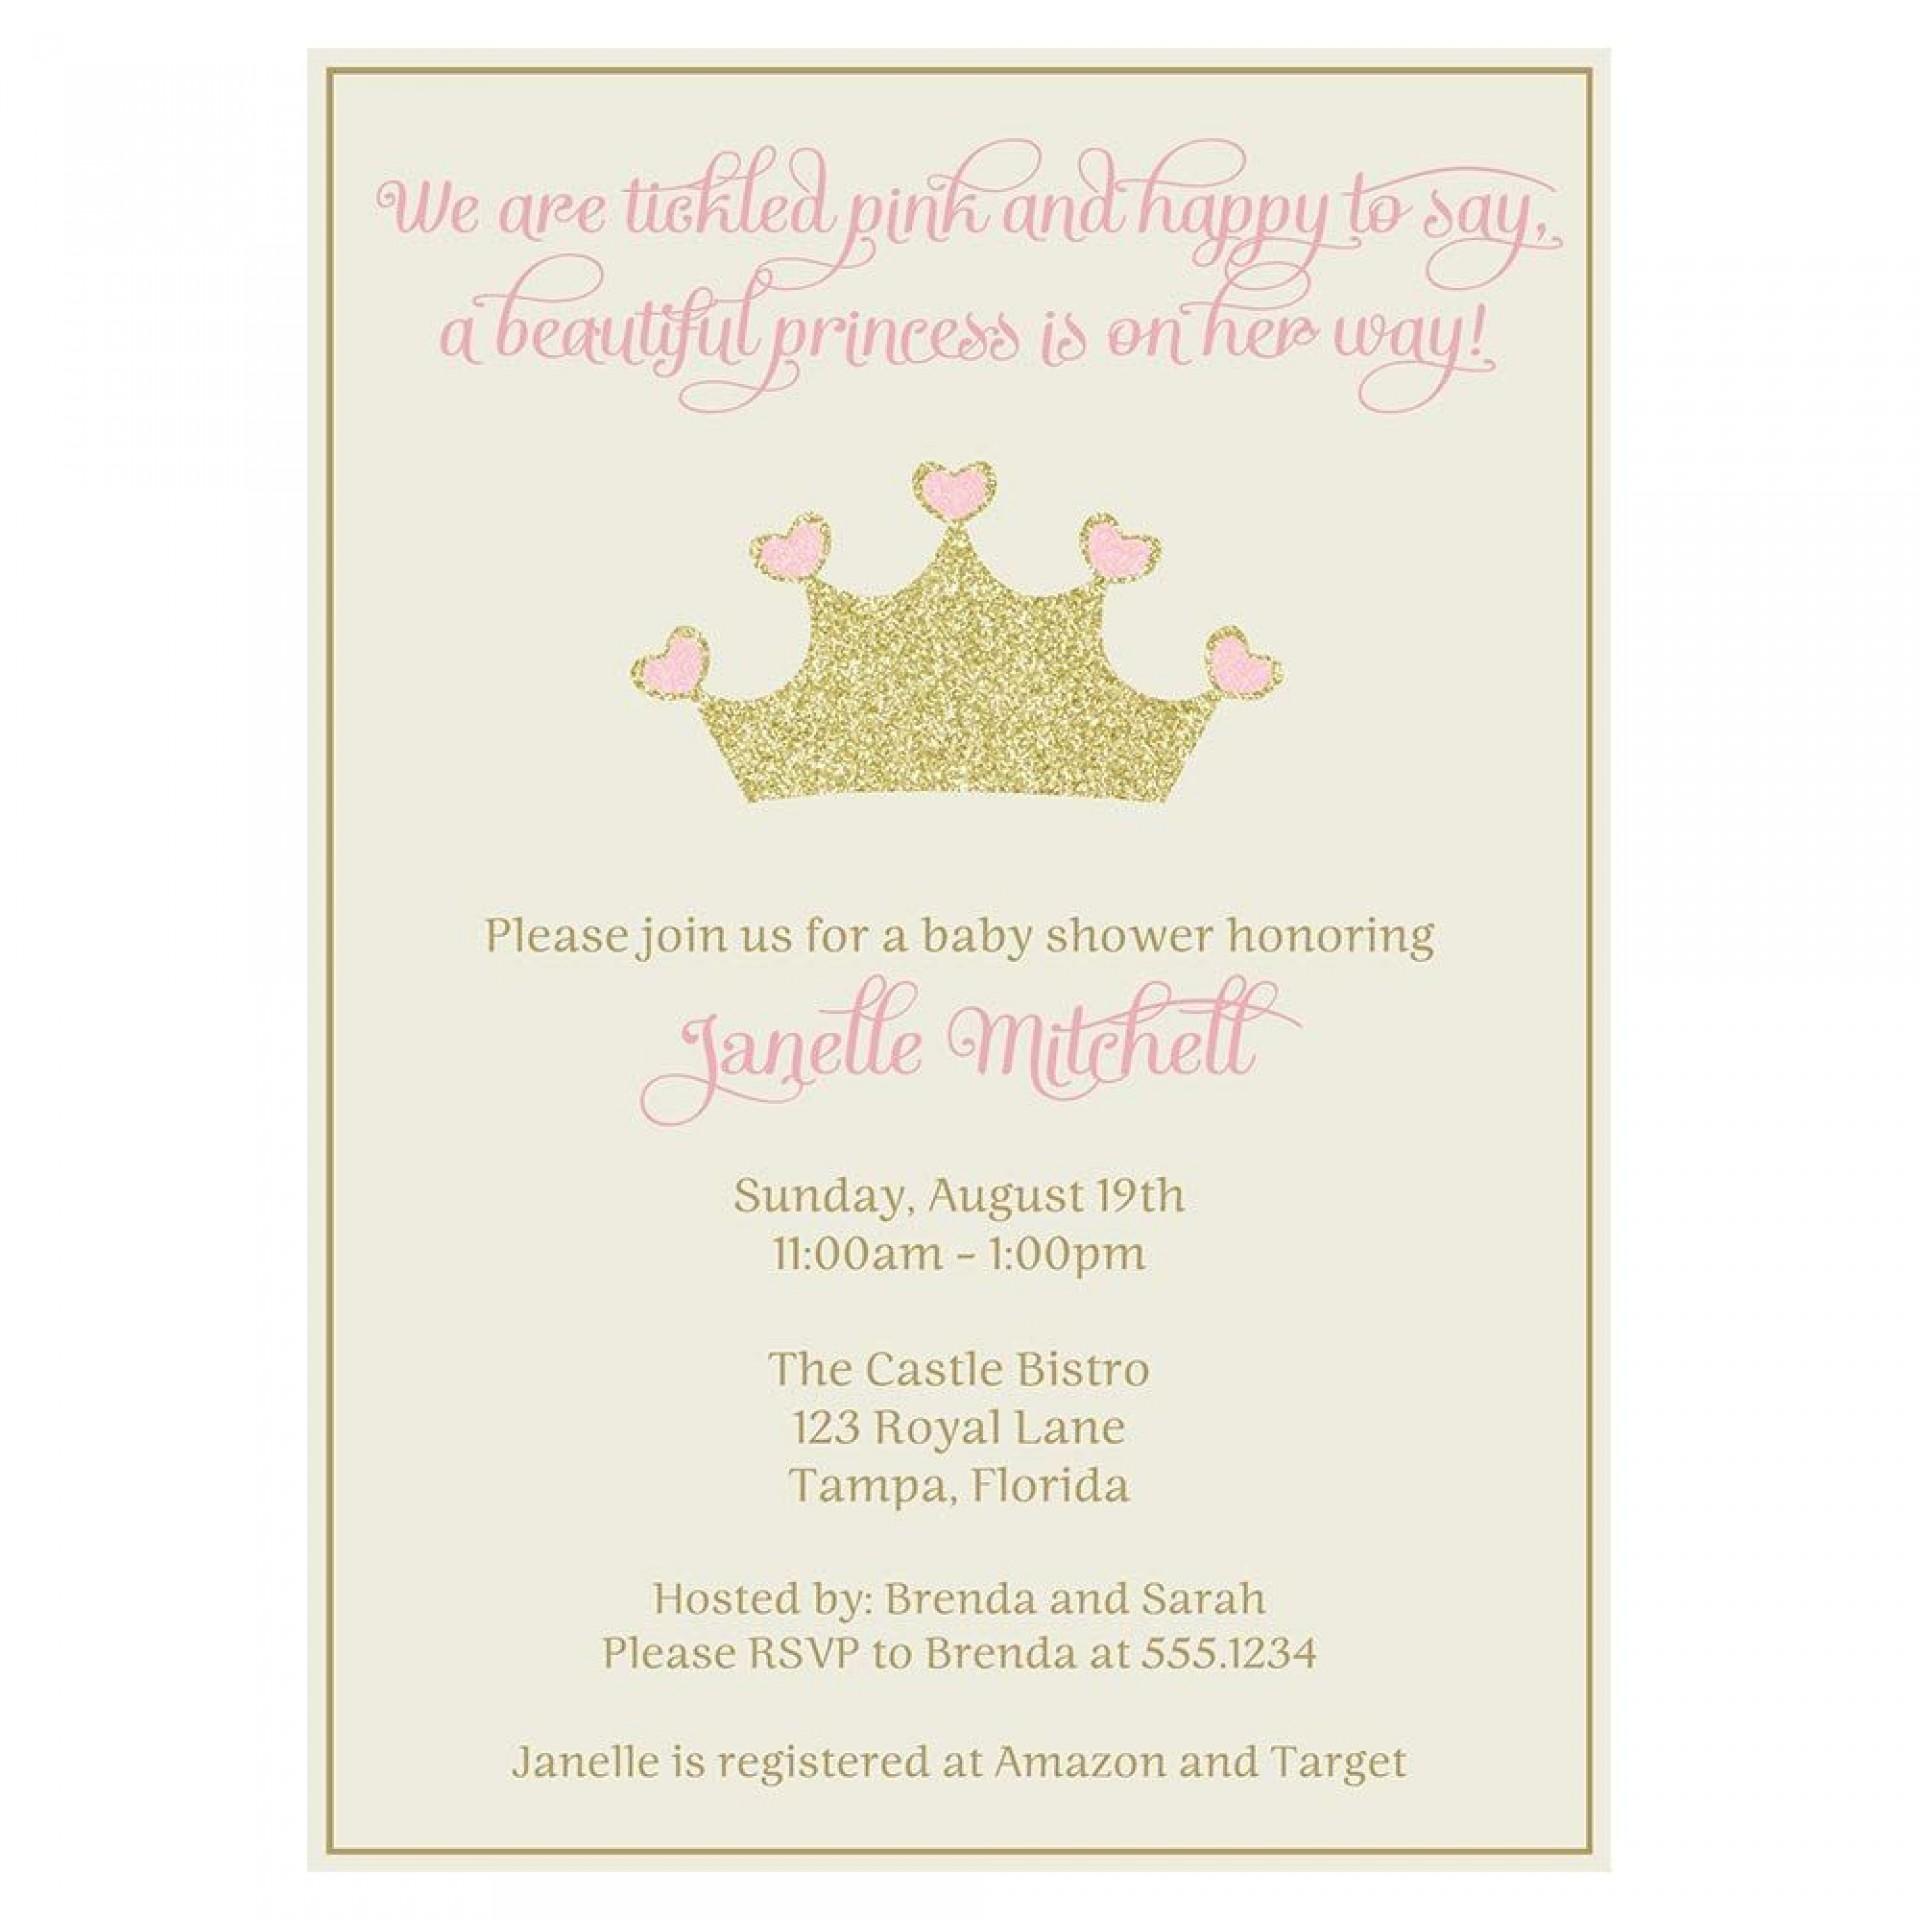 002 Outstanding Baby Shower Invitation Girl Princes Image  Princess Theme1920